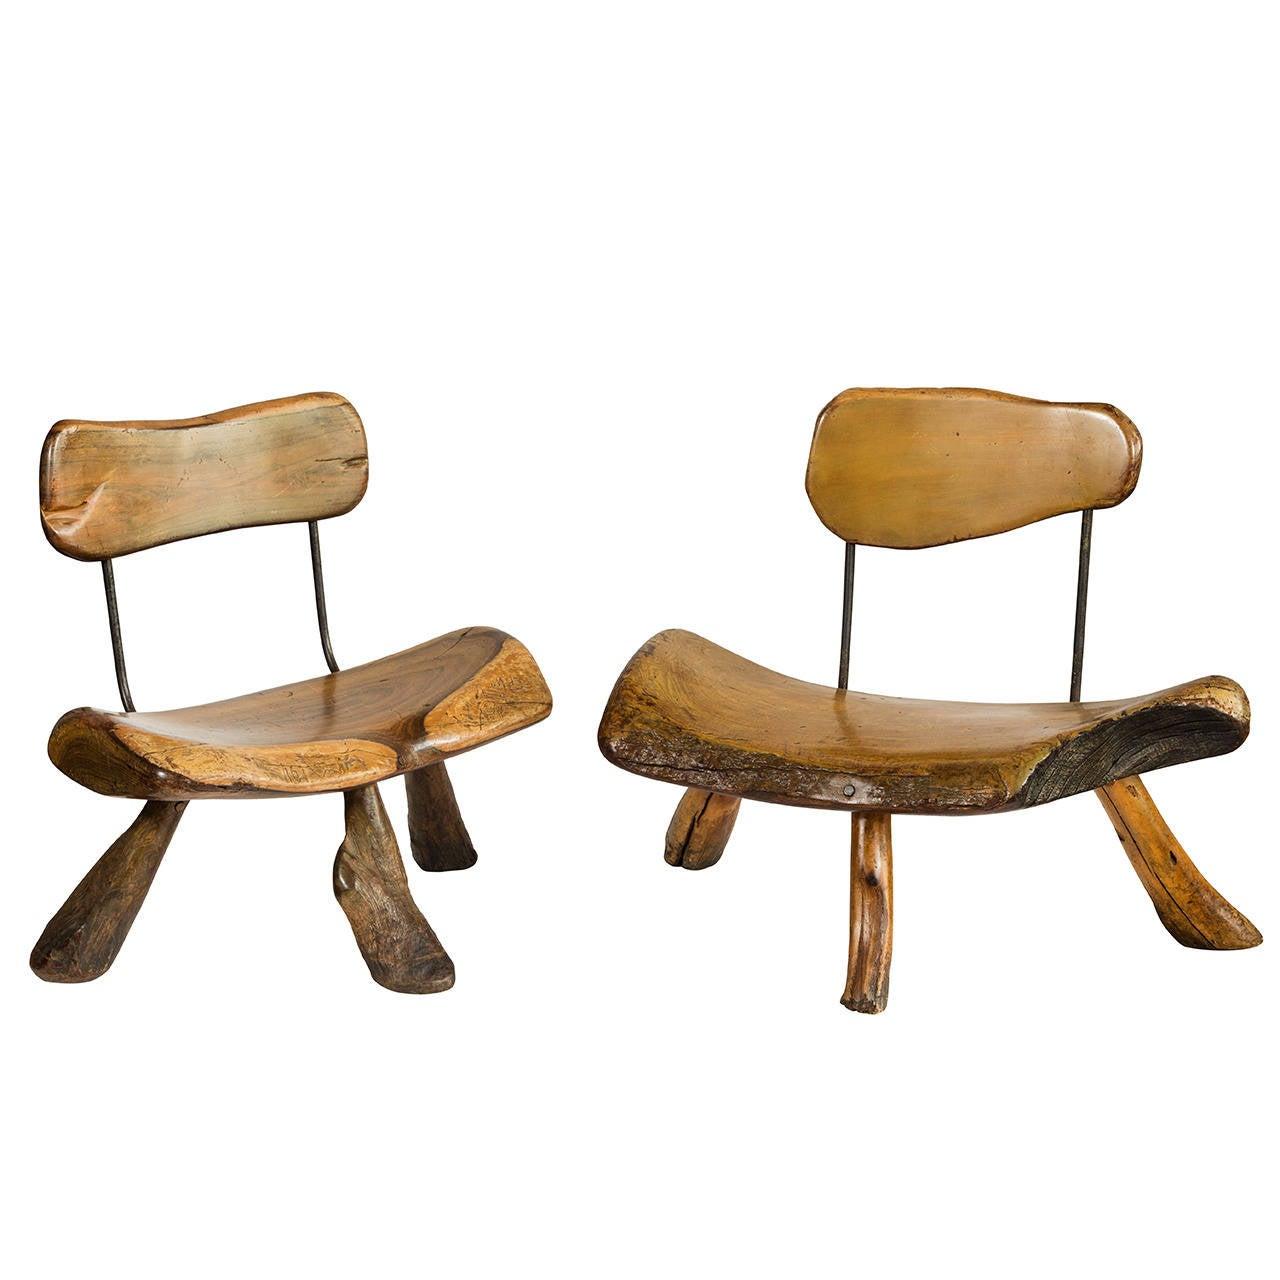 Handmade Wood And Iron Chairs At 1stdibs